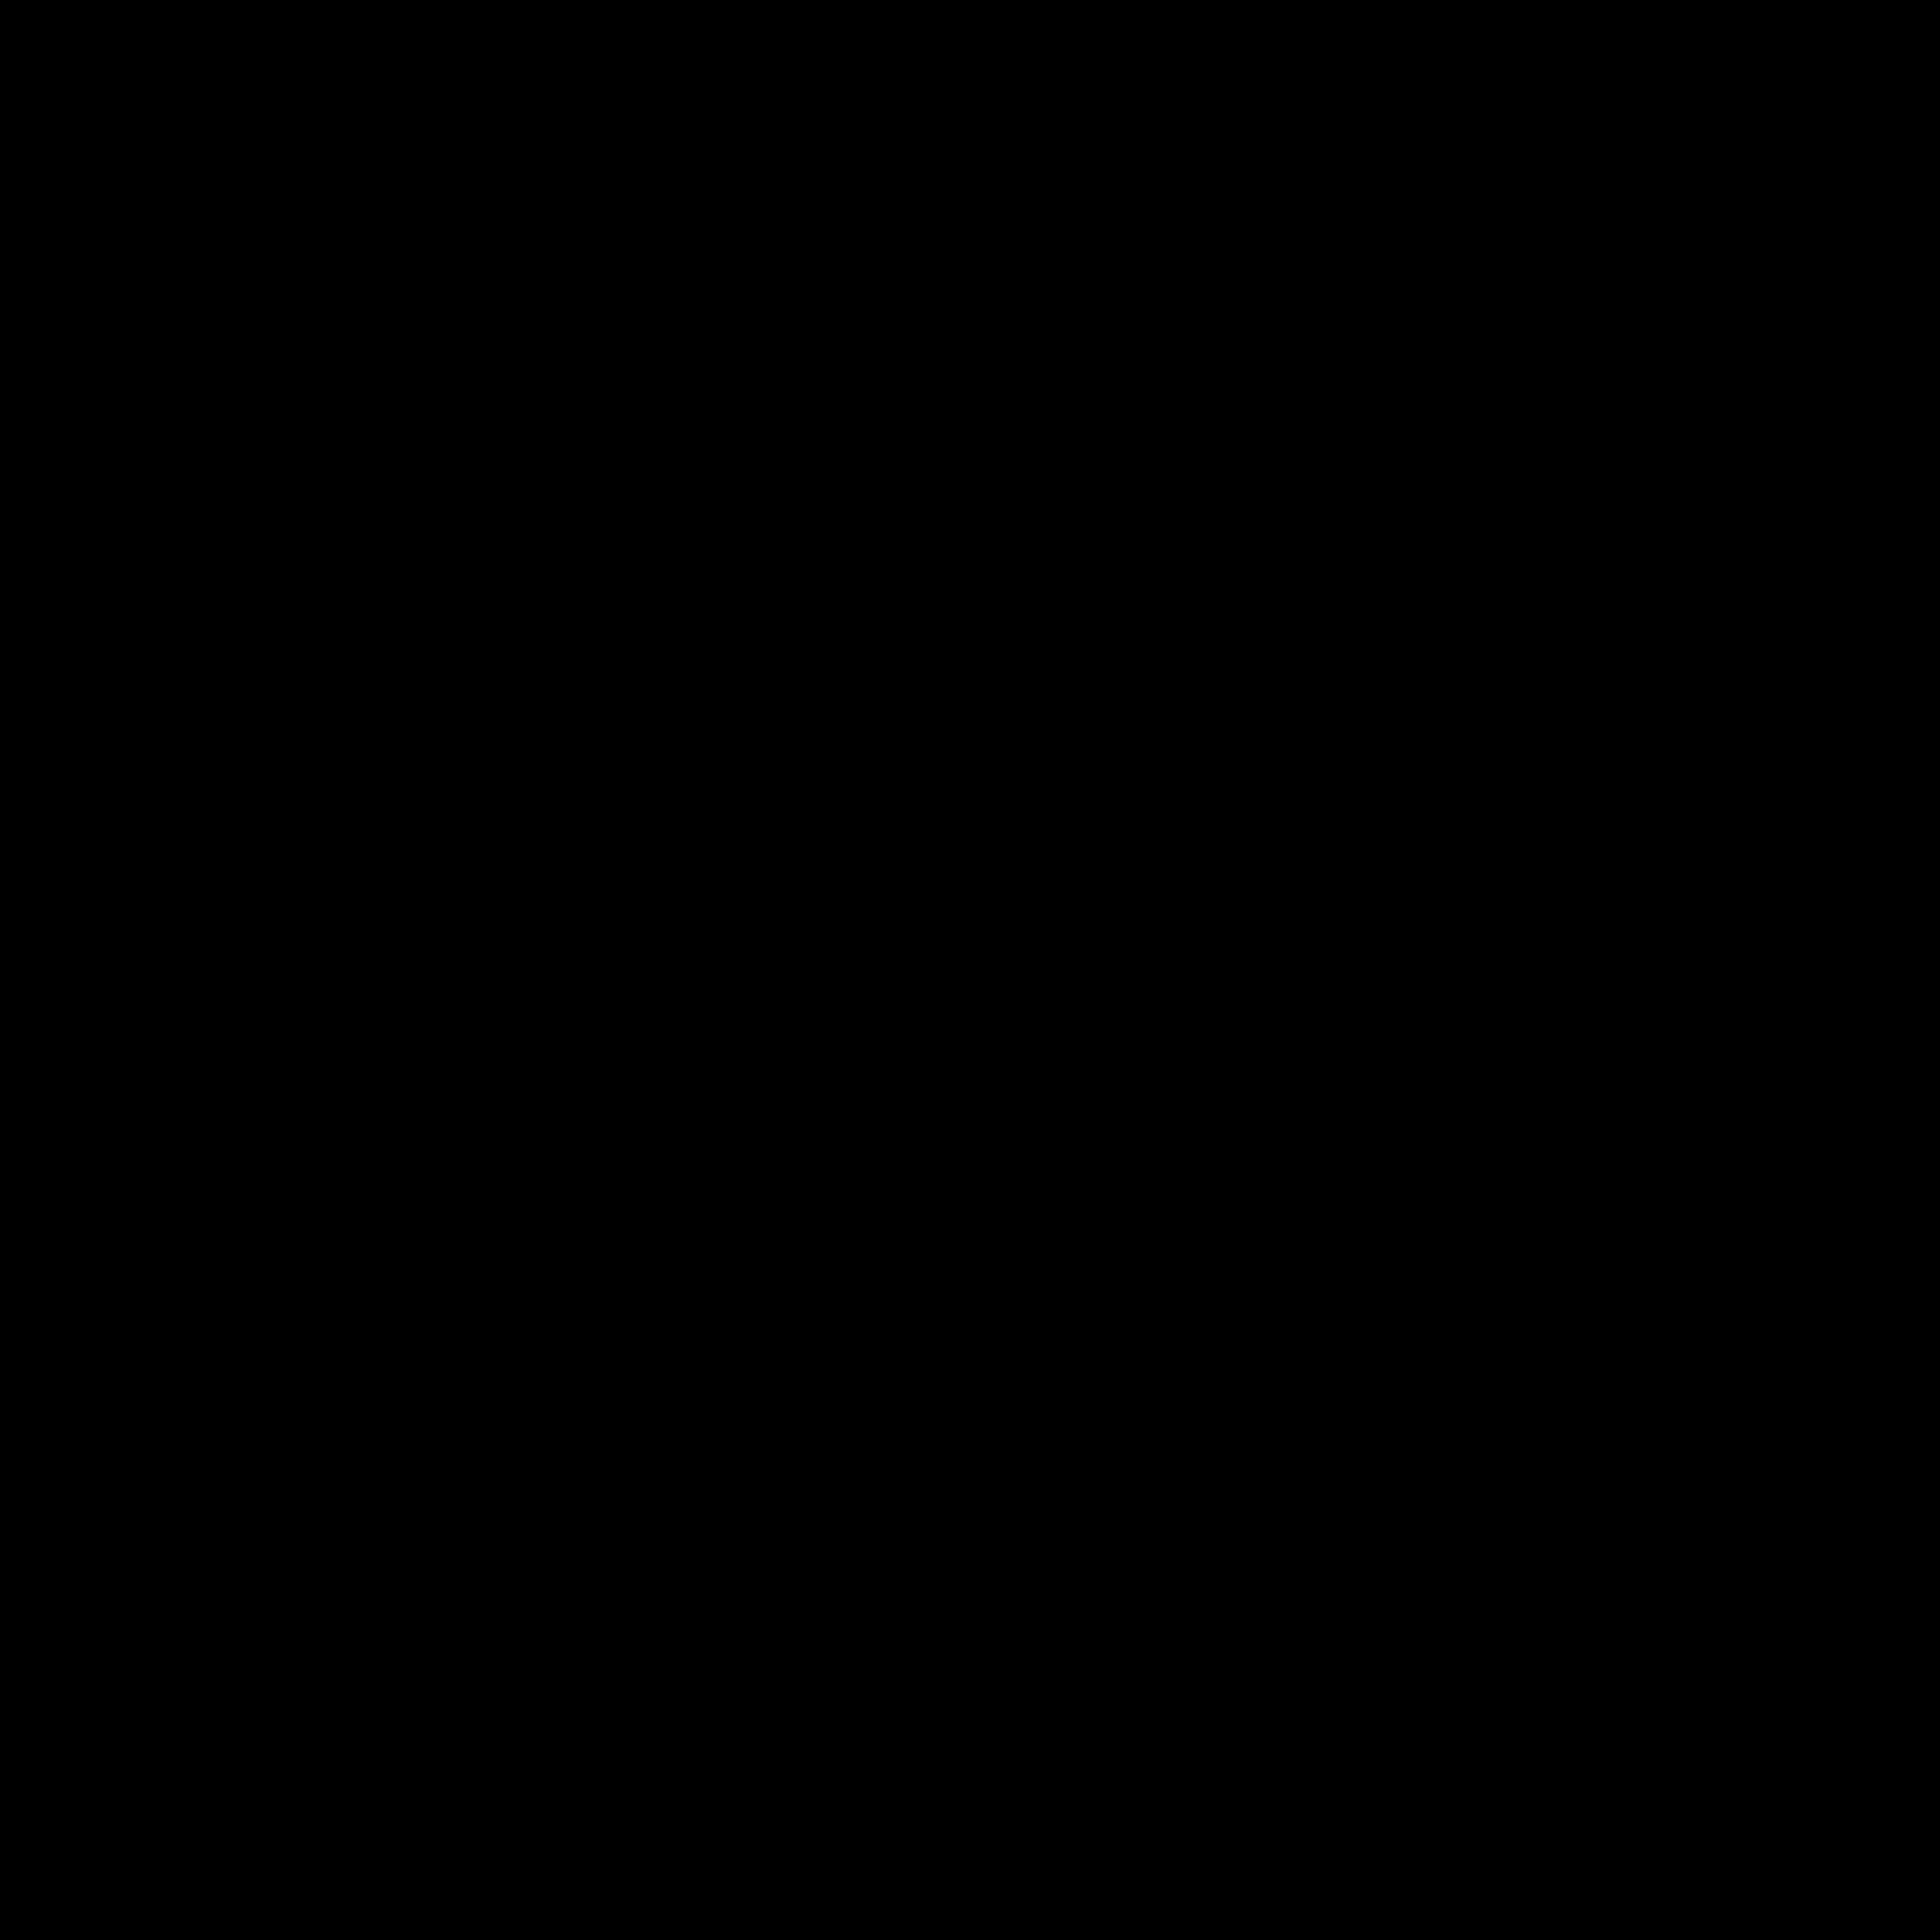 umbro logo 0 - Umbro Logo